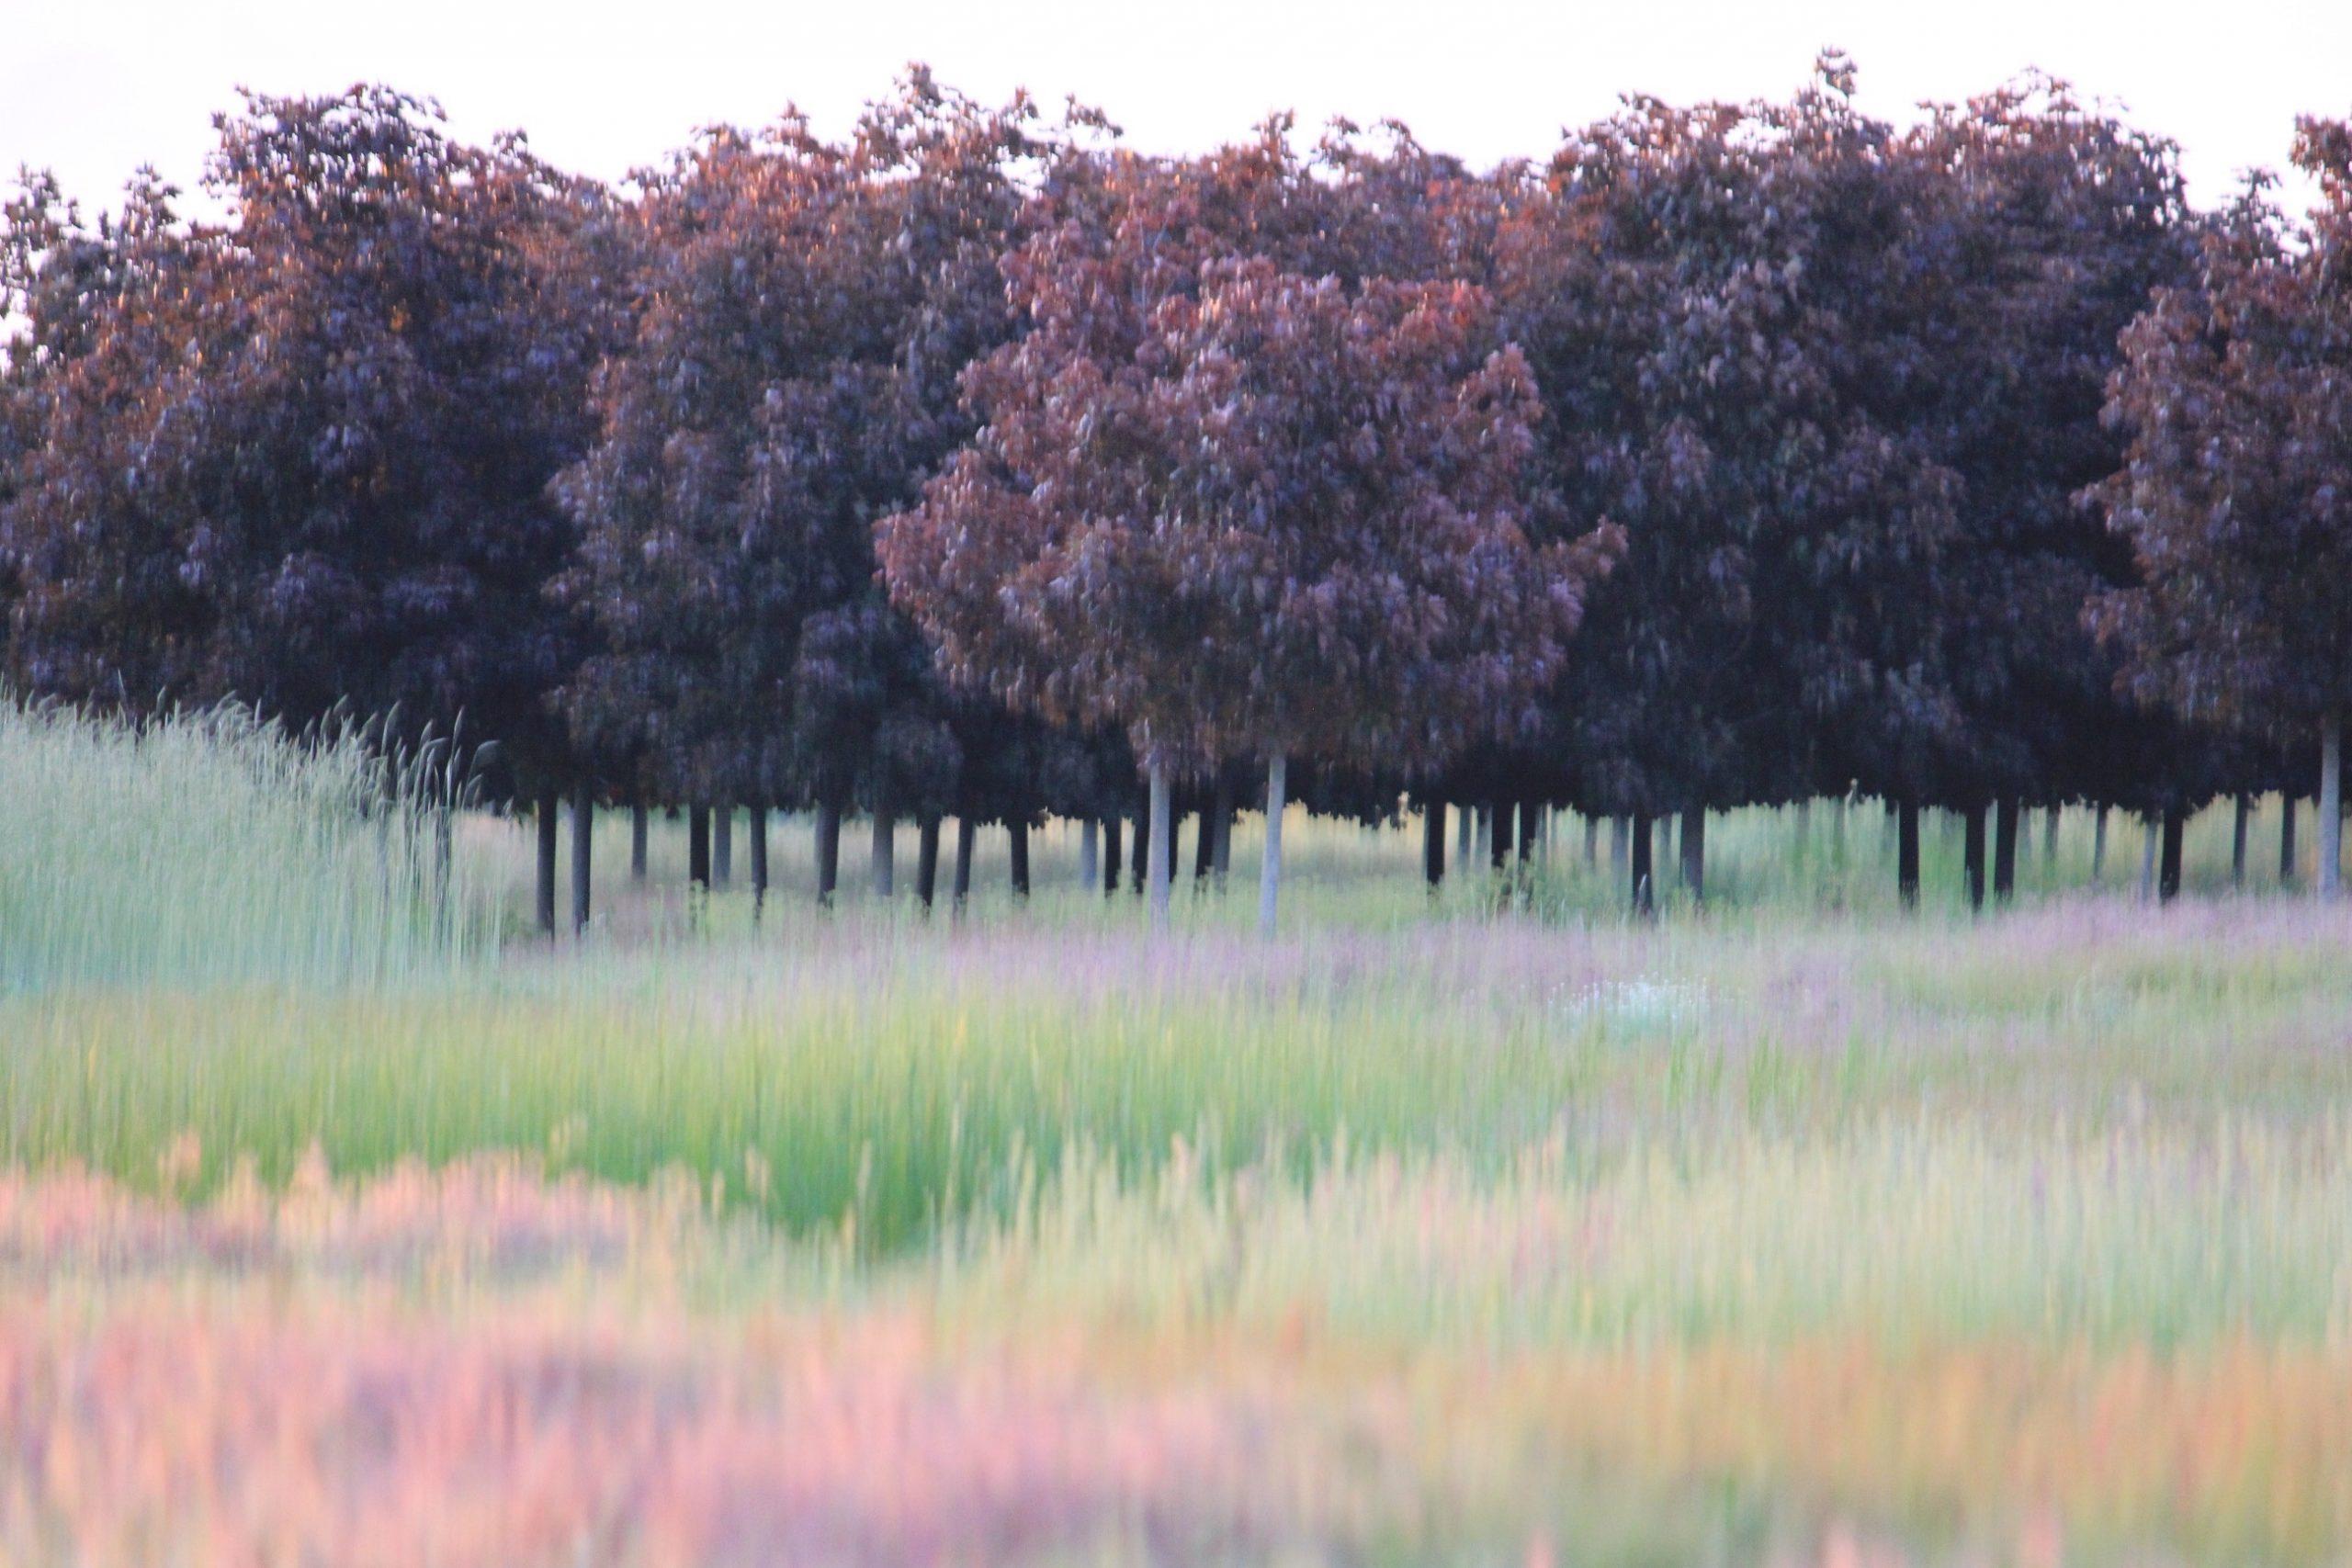 Blurry Purple Trees - Lorena Doherty